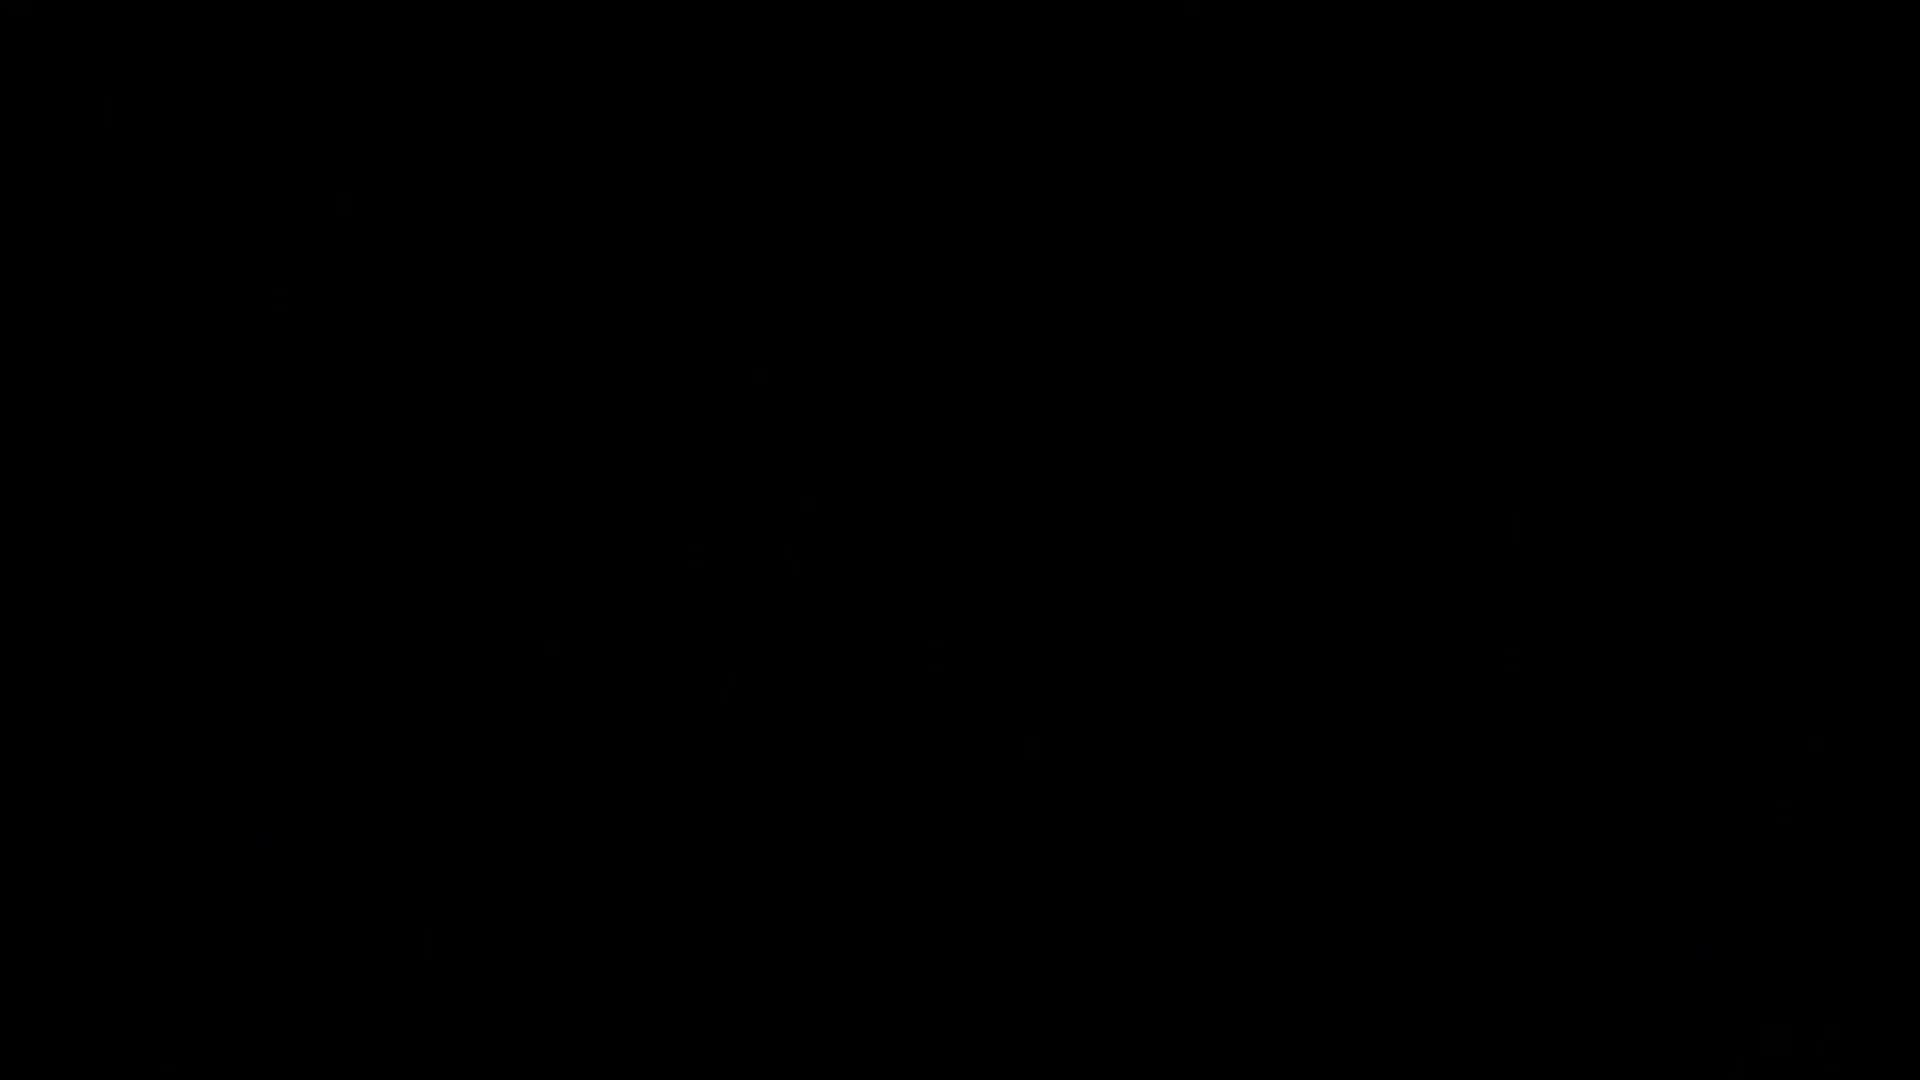 Victoria's Secret commercial.  #womensfashion #womensstyle #fashionforwomen #blog #blogger #fashionista #accessoreries #designer #luxury #lifestyle #couture #ootd #picoftheday #dress #shorts #heels #shoes #life #bloging #instablogger #adityathaokar #maleblogger #slay #redcarpet #winterstyle #womensfashion #womensstyle #fashionforwomen #blog #blogger #fashionista #accessoreries #designer #luxury #lifestyle #couture #ootd #picoftheday #dress #shorts #heels #shoes #life #bloging #instablogger #adityathaokar #maleblogger #slay #redcarpet #winterstyle #womensfashion #womensstyle #fashionforwomen #blog #blogger #fashionista #accessoreries #designer #luxury #lifestyle #couture #ootd #lingerie #victoriassecret #models